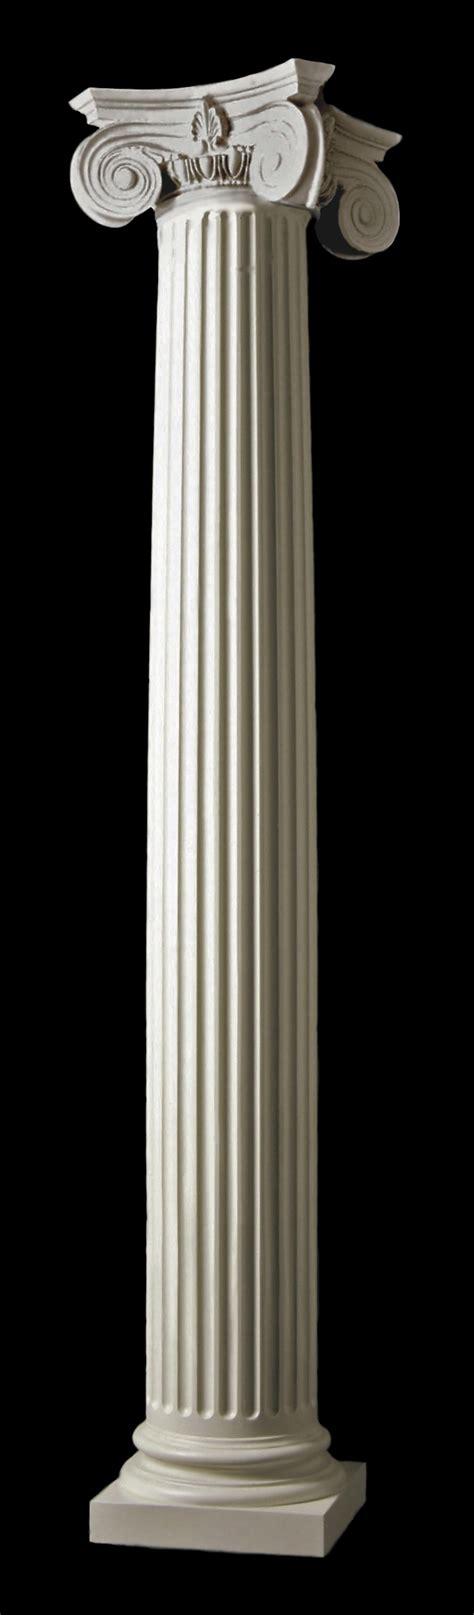 empire wood columns attic base chadsworth s 1 800 columns